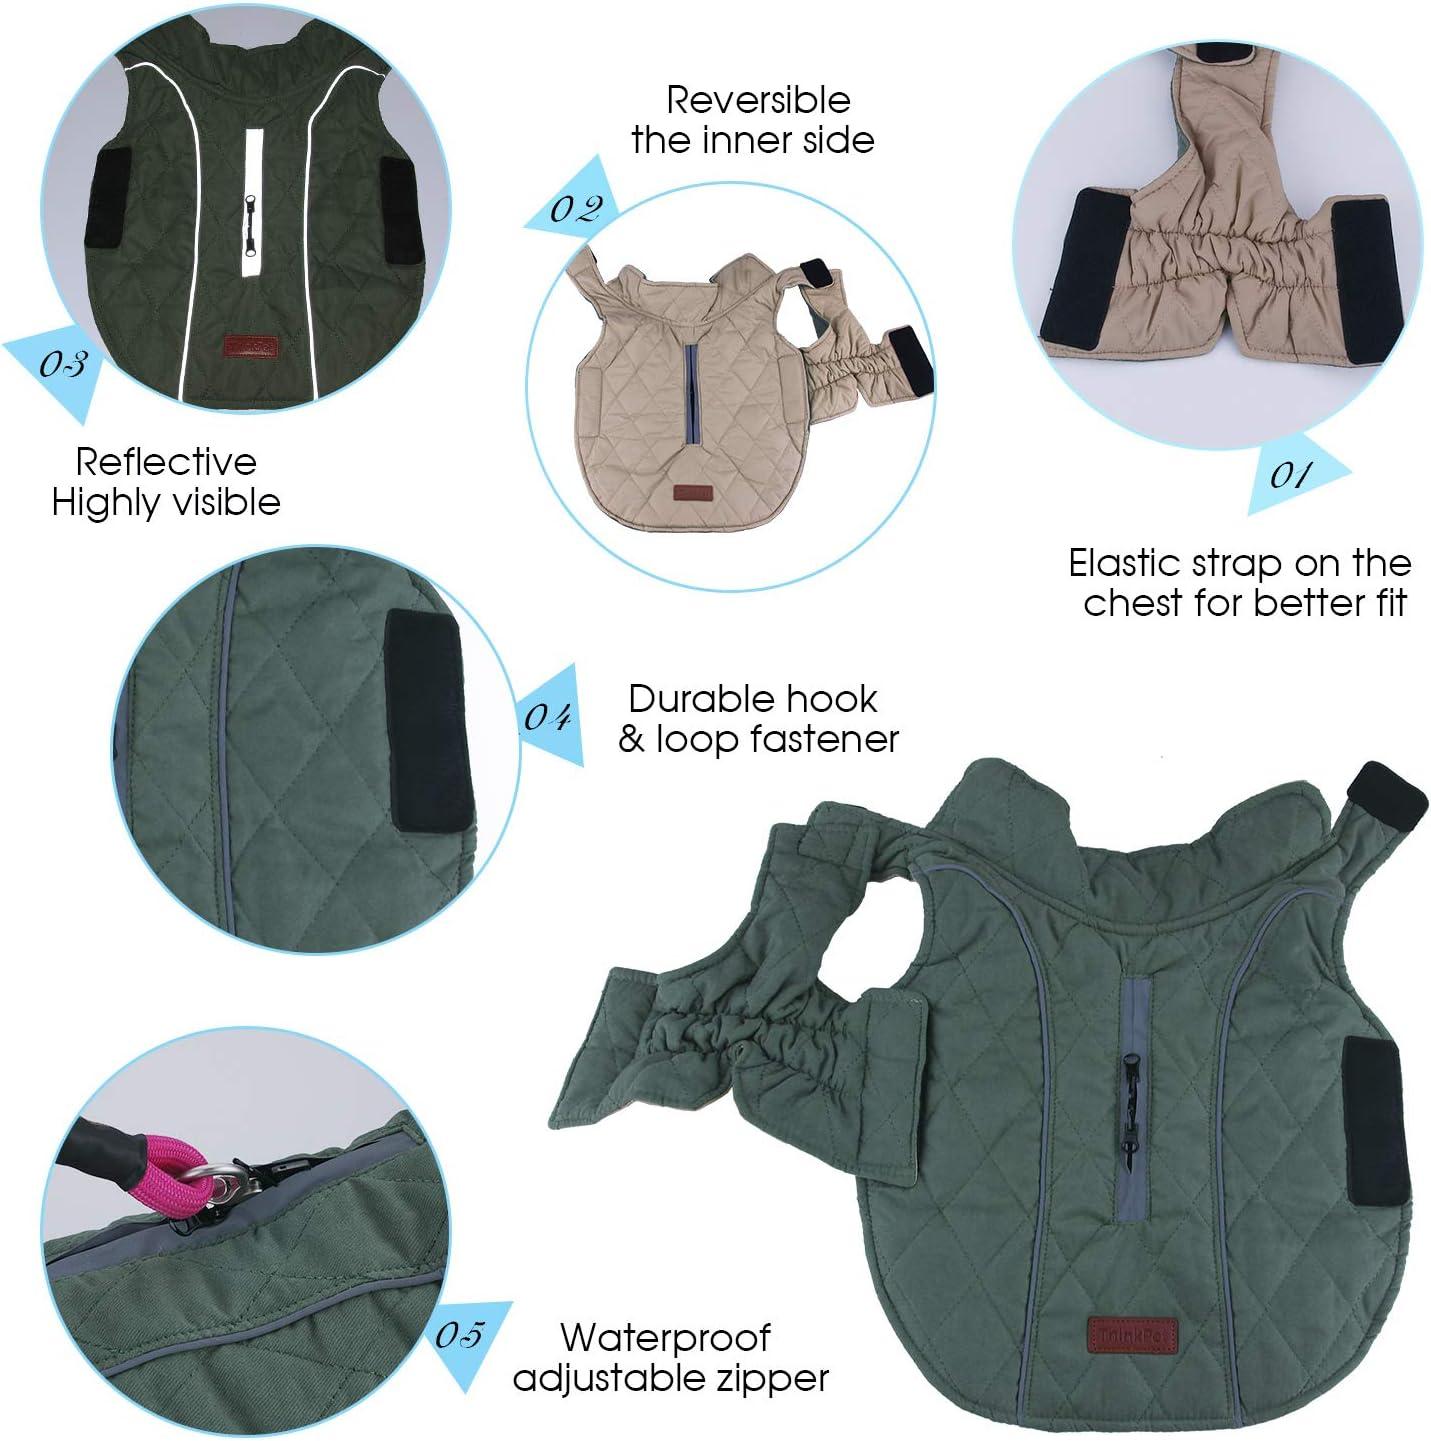 Thick Padded Comfortable Winter Dog Jacket ThinkPet Warm Reversible Dog Coat Reflective Safey Dog Vest L Blue